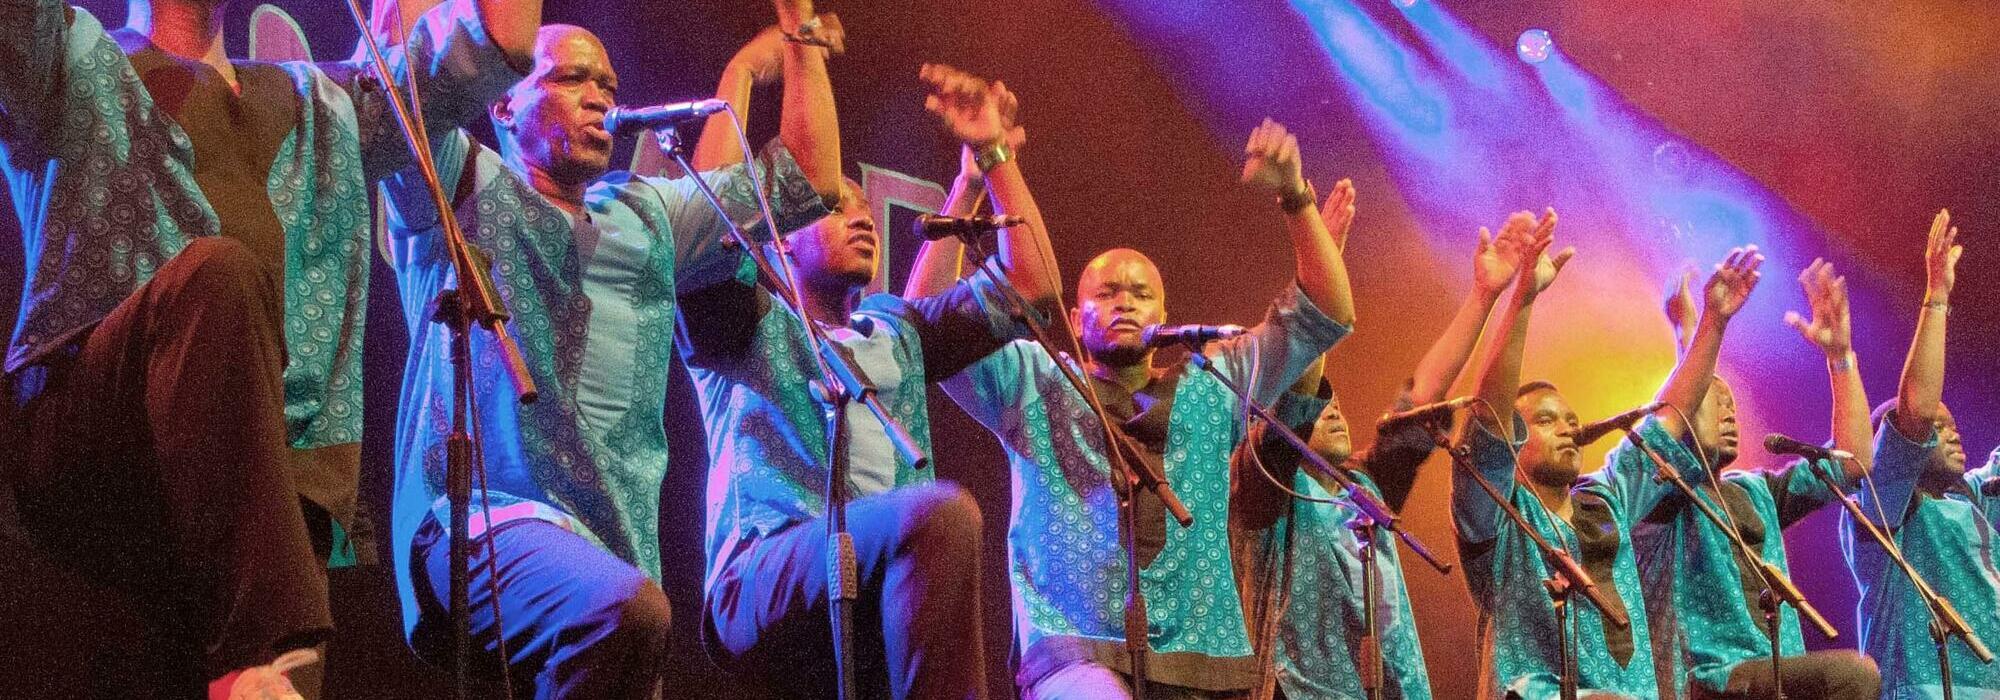 A Ladysmith Black Mambazo live event